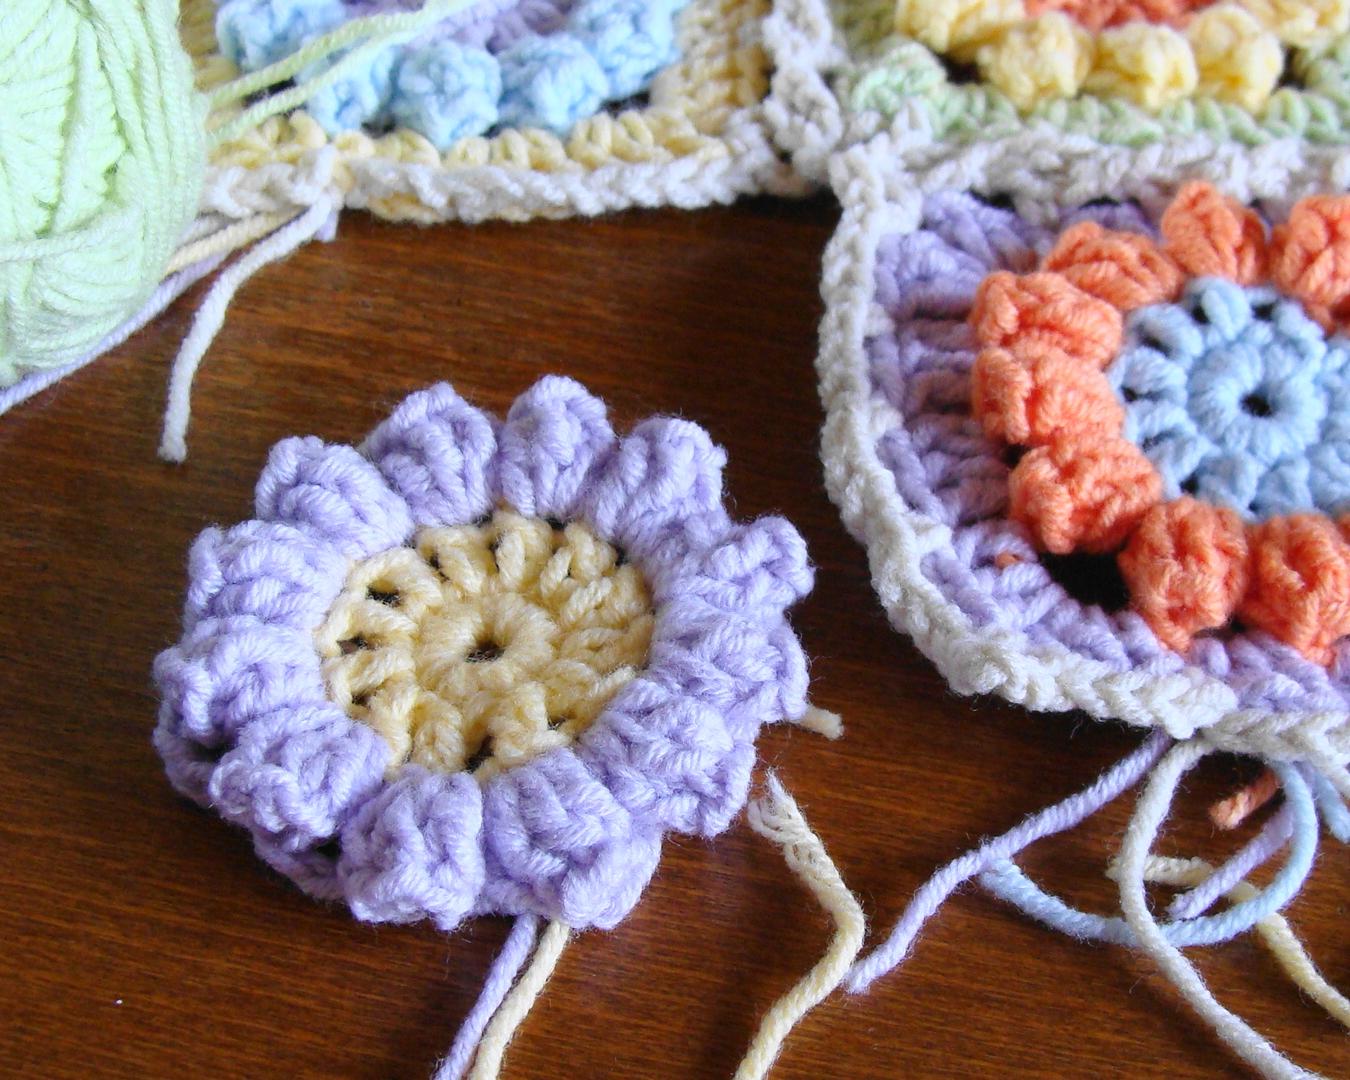 Granny Square Knitting Pattern : Knitting meeting granny flower square free pattern